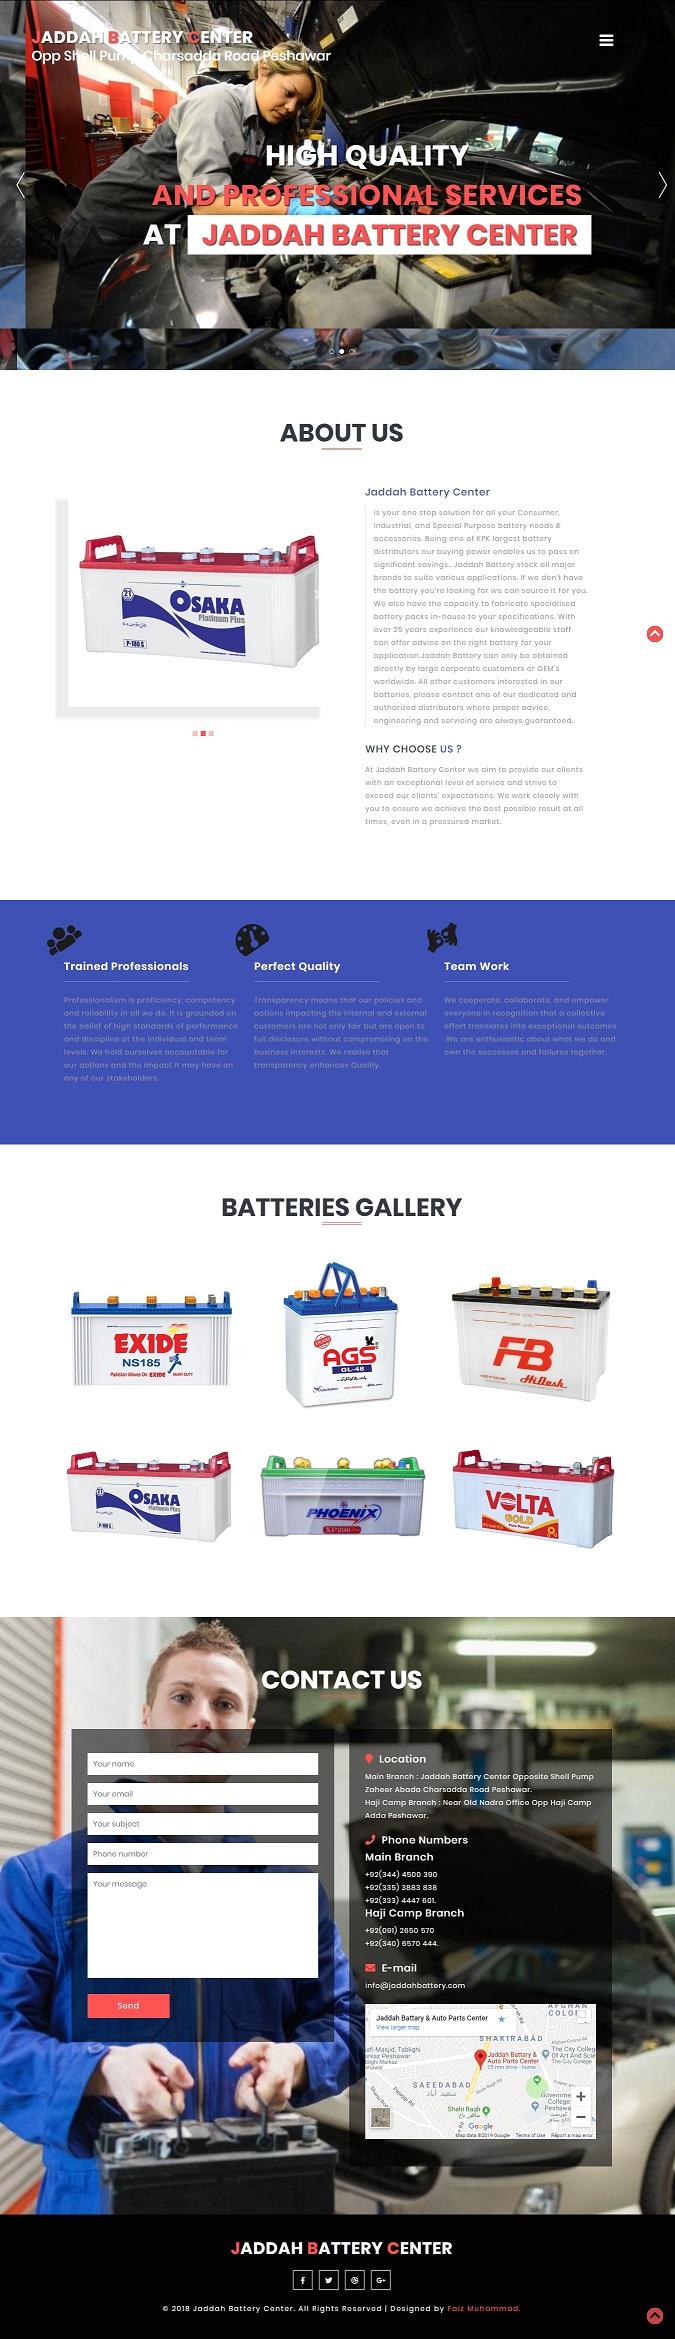 Jaddah Batteries & Auto Parts Center Peshawar